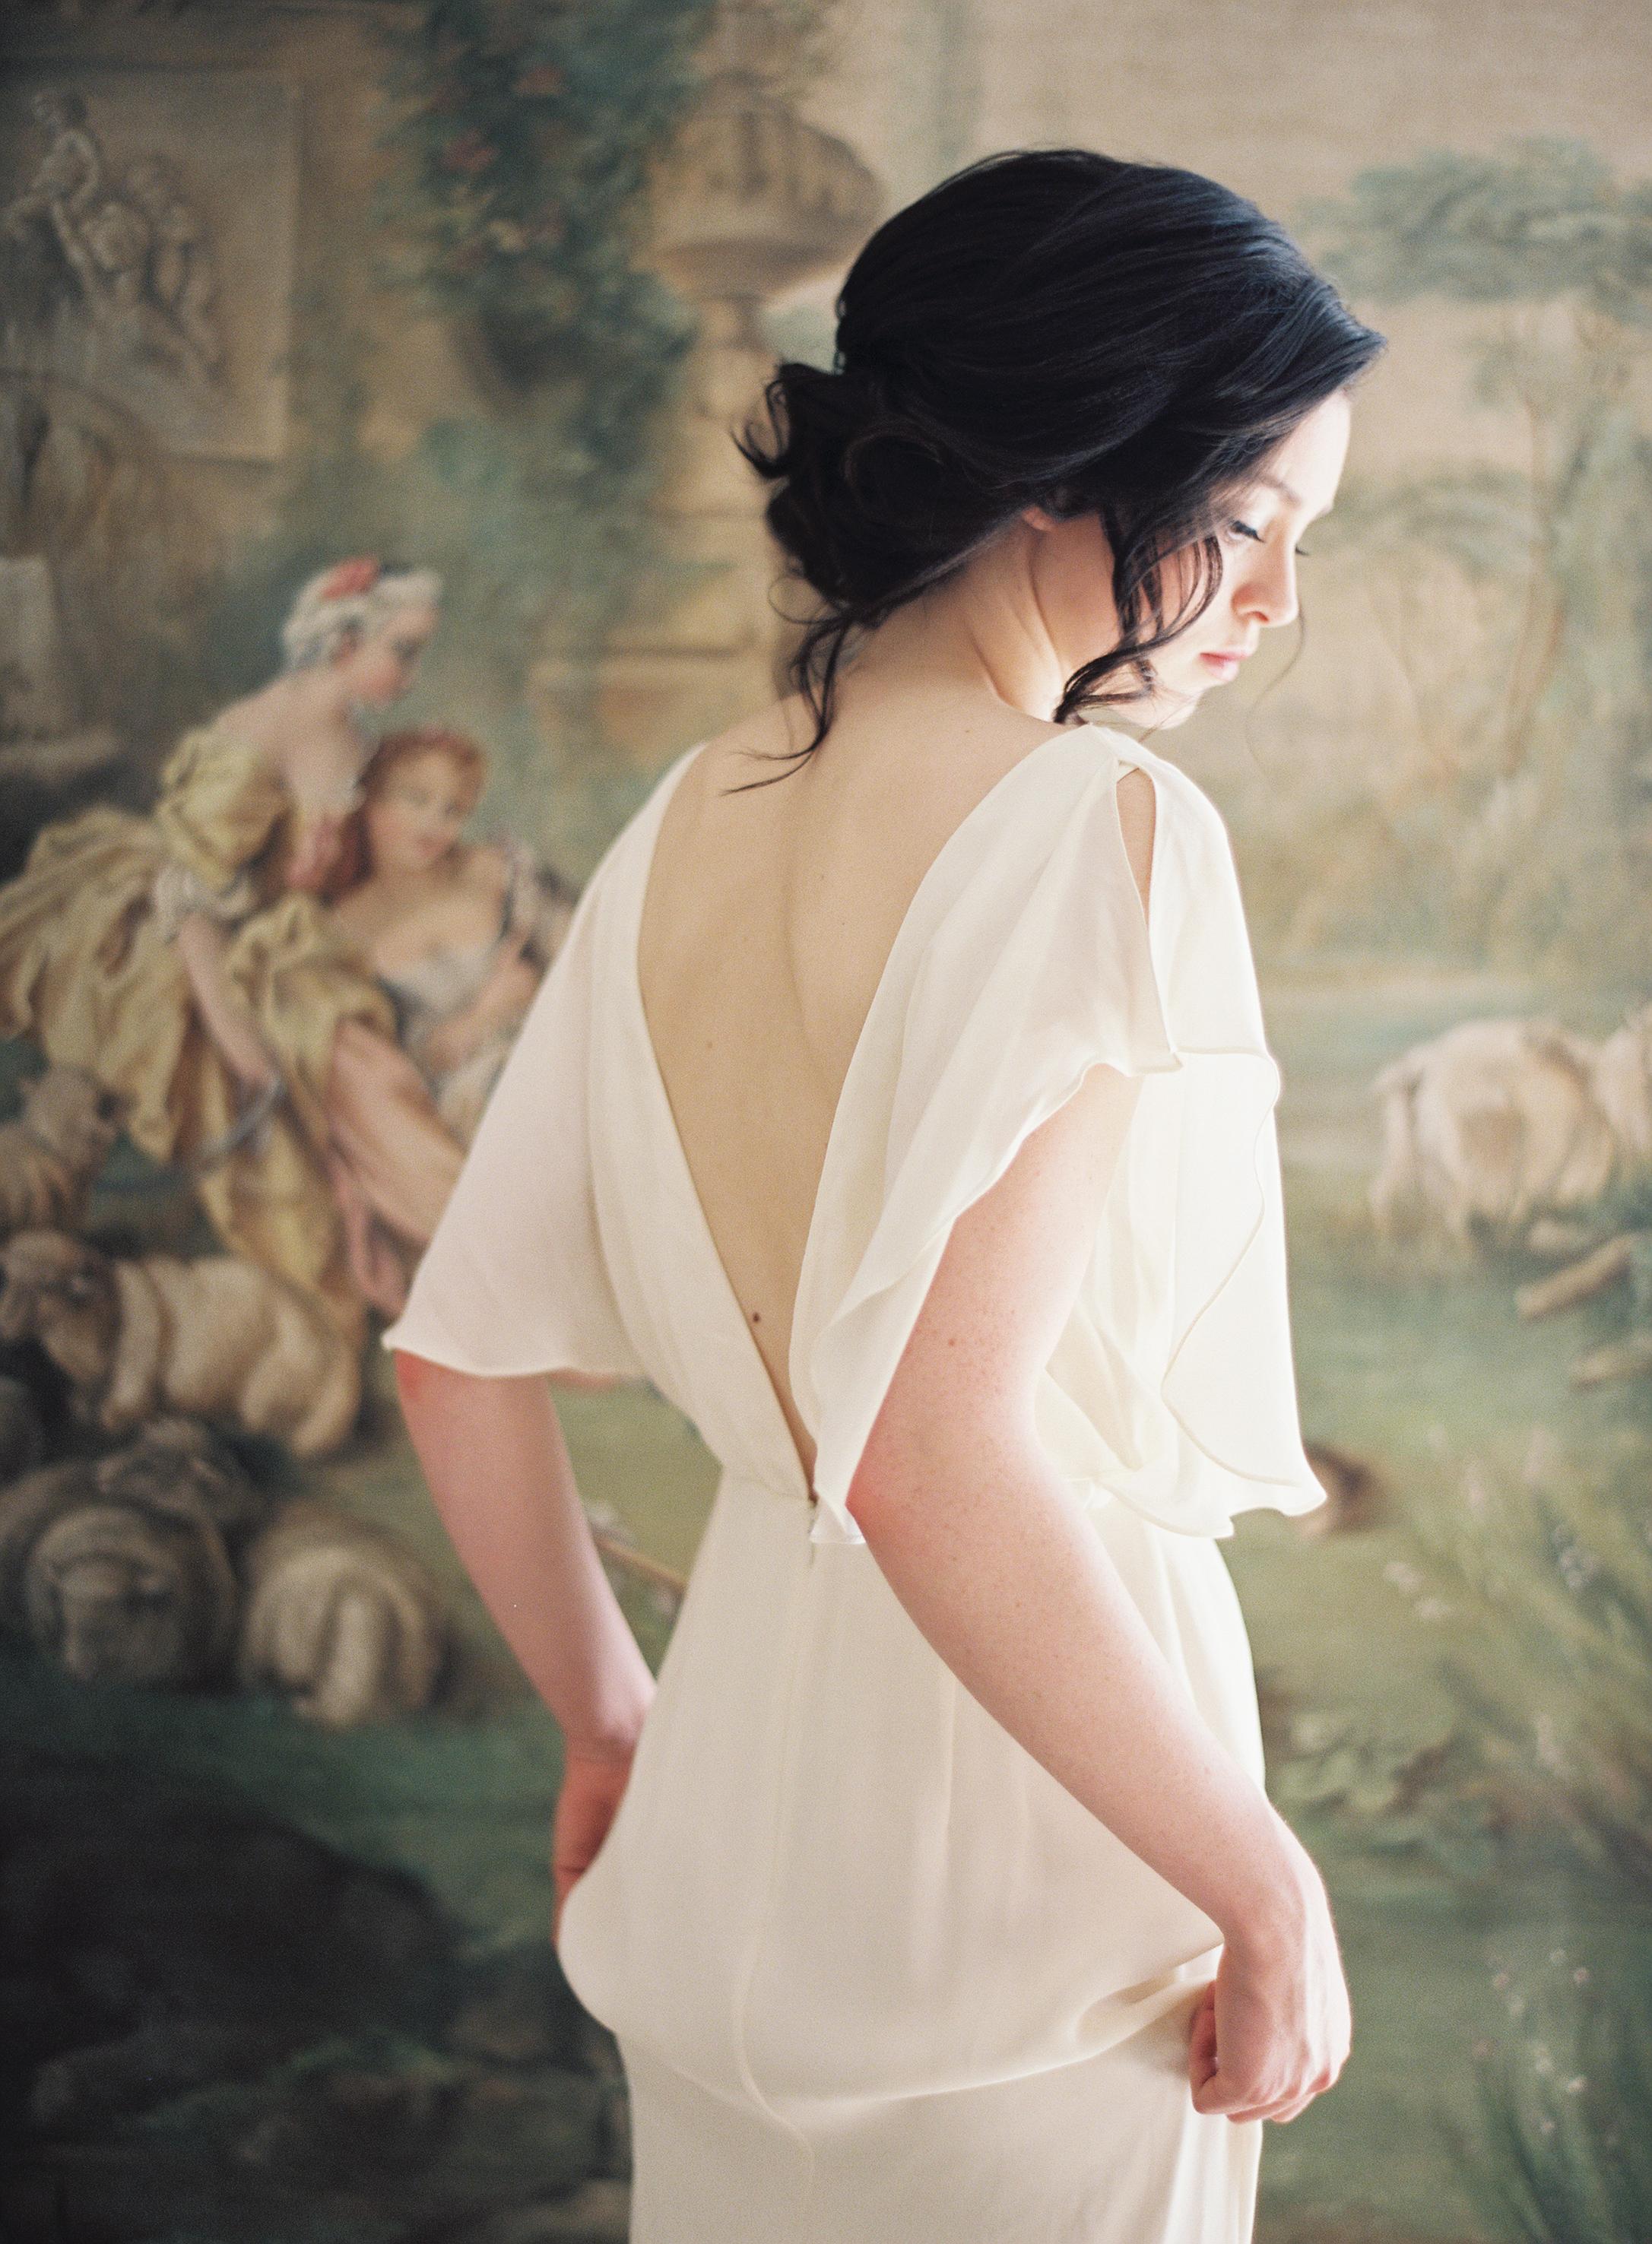 JenHuang-Bridal-Grecco-4-006353-R1-011.jpg